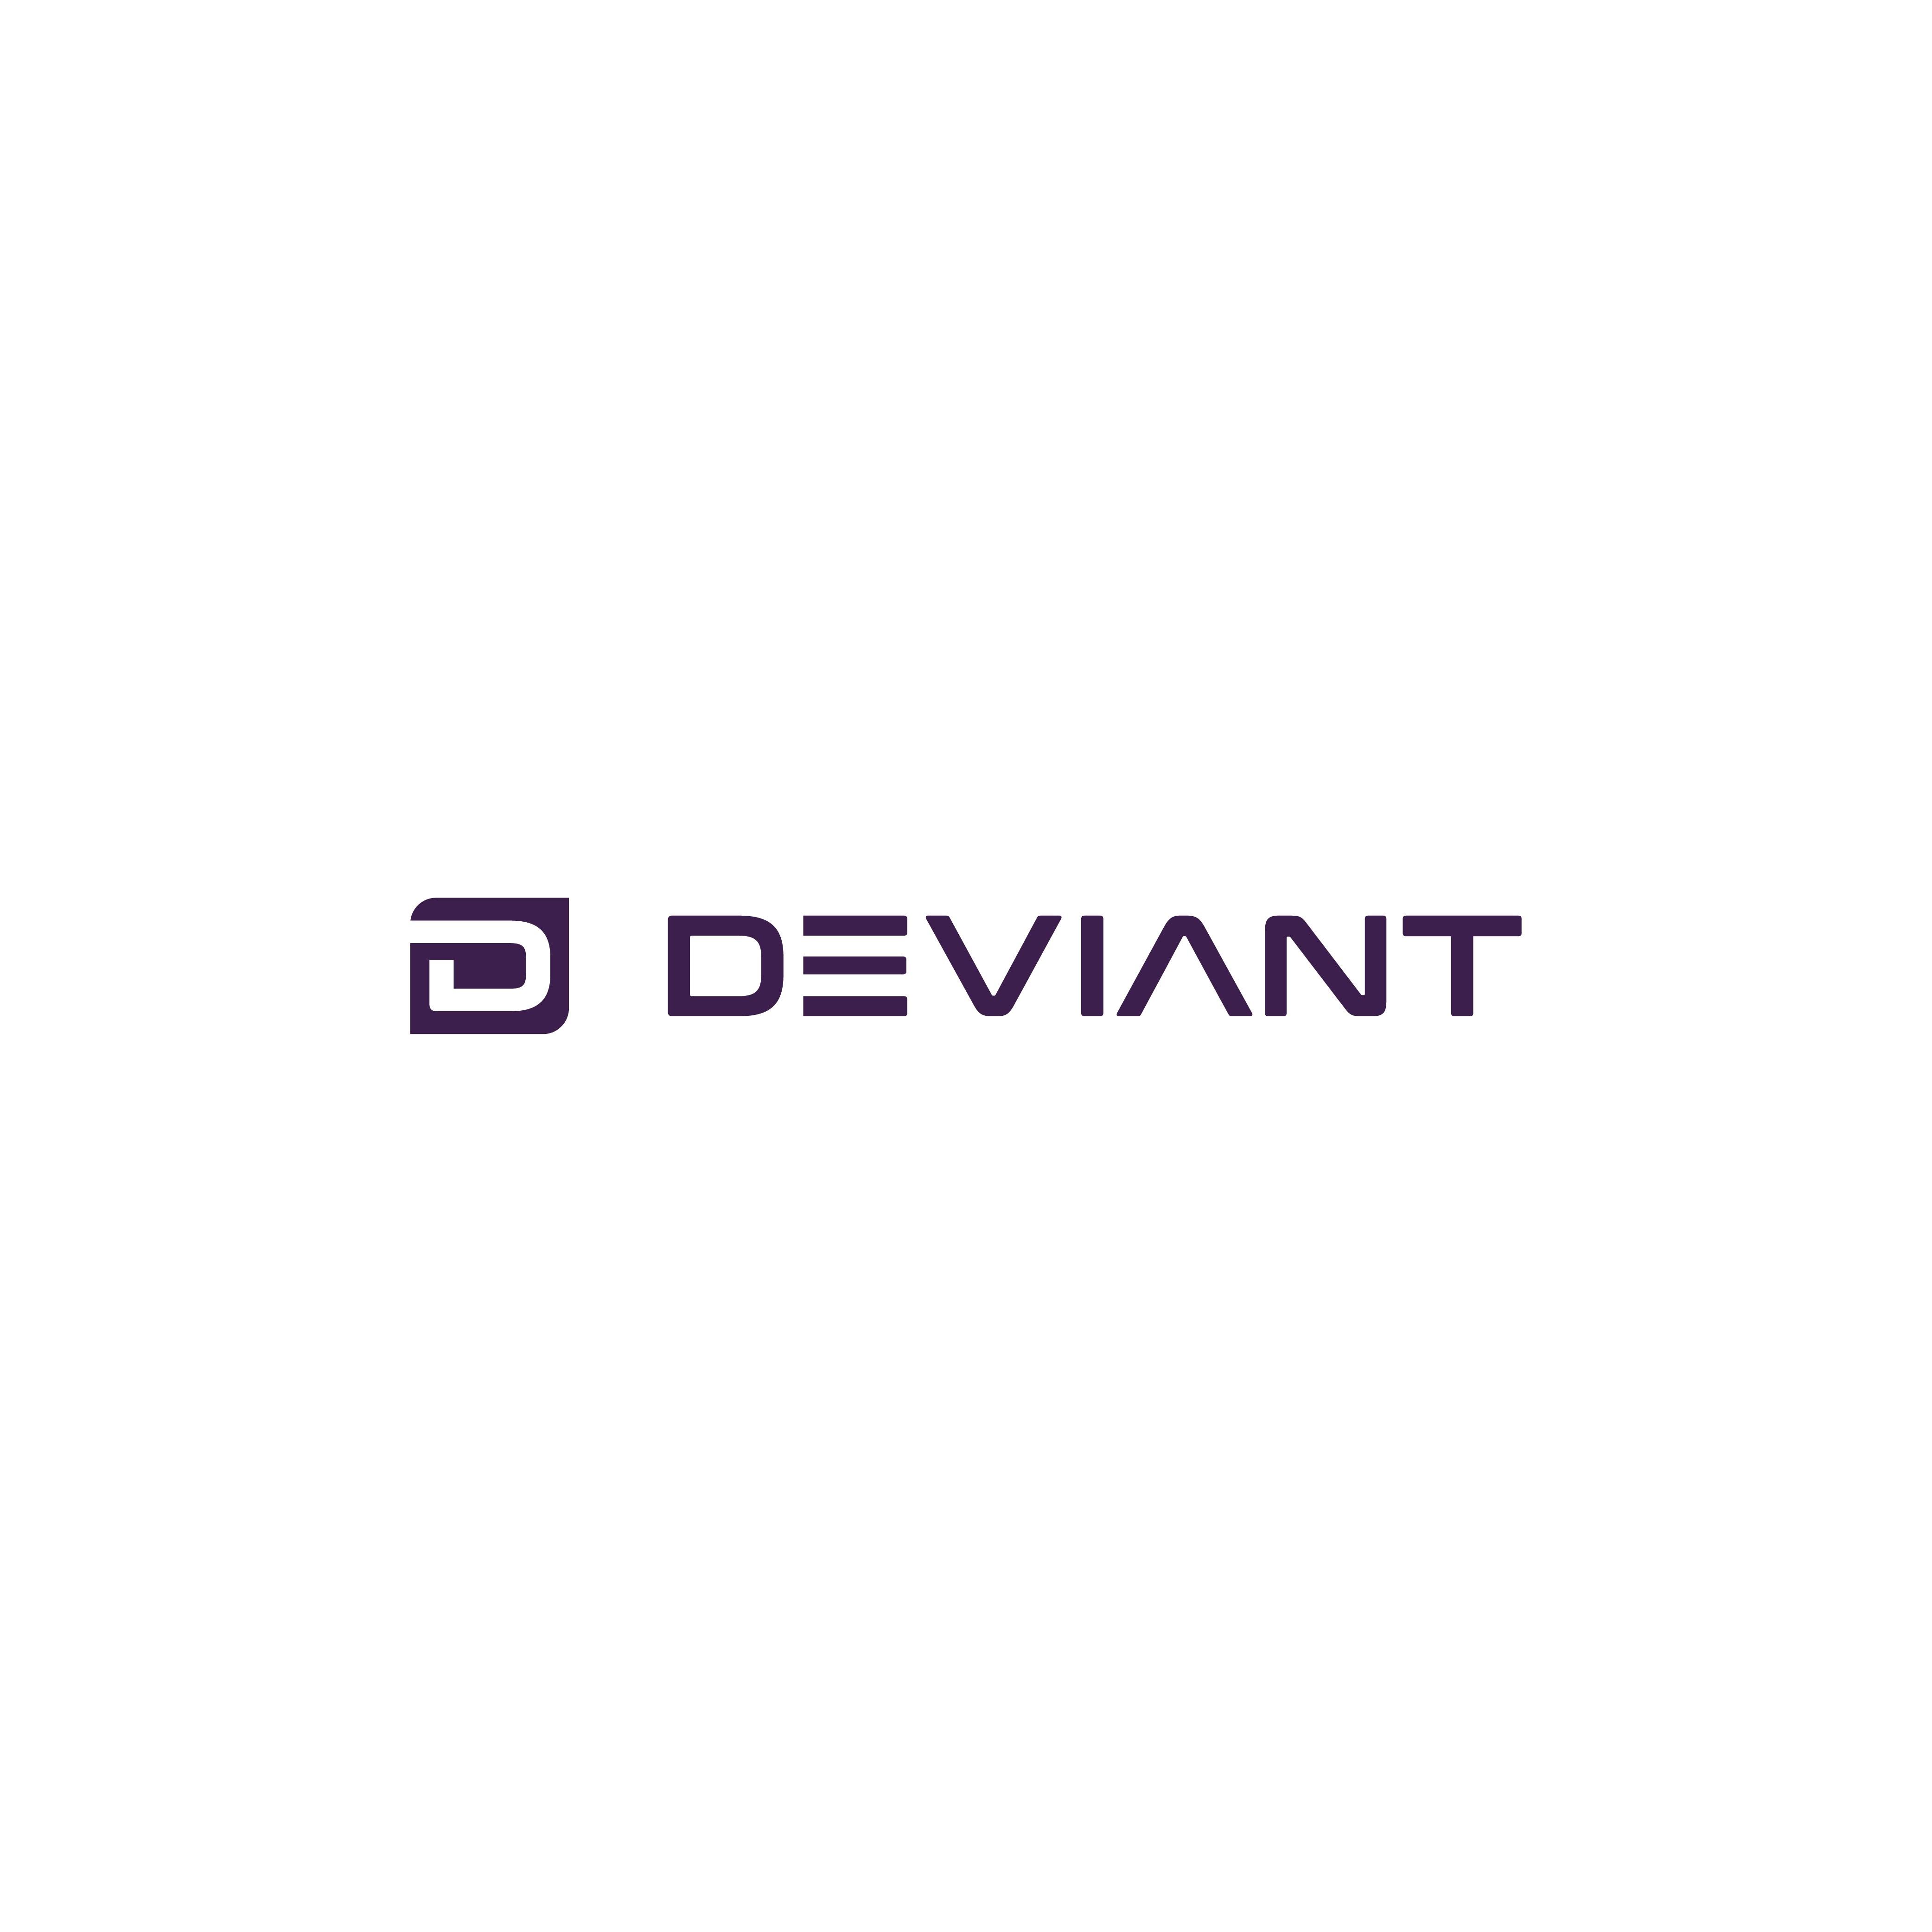 Design a sexy logo for a fun and creative underwear brand, Deviant!